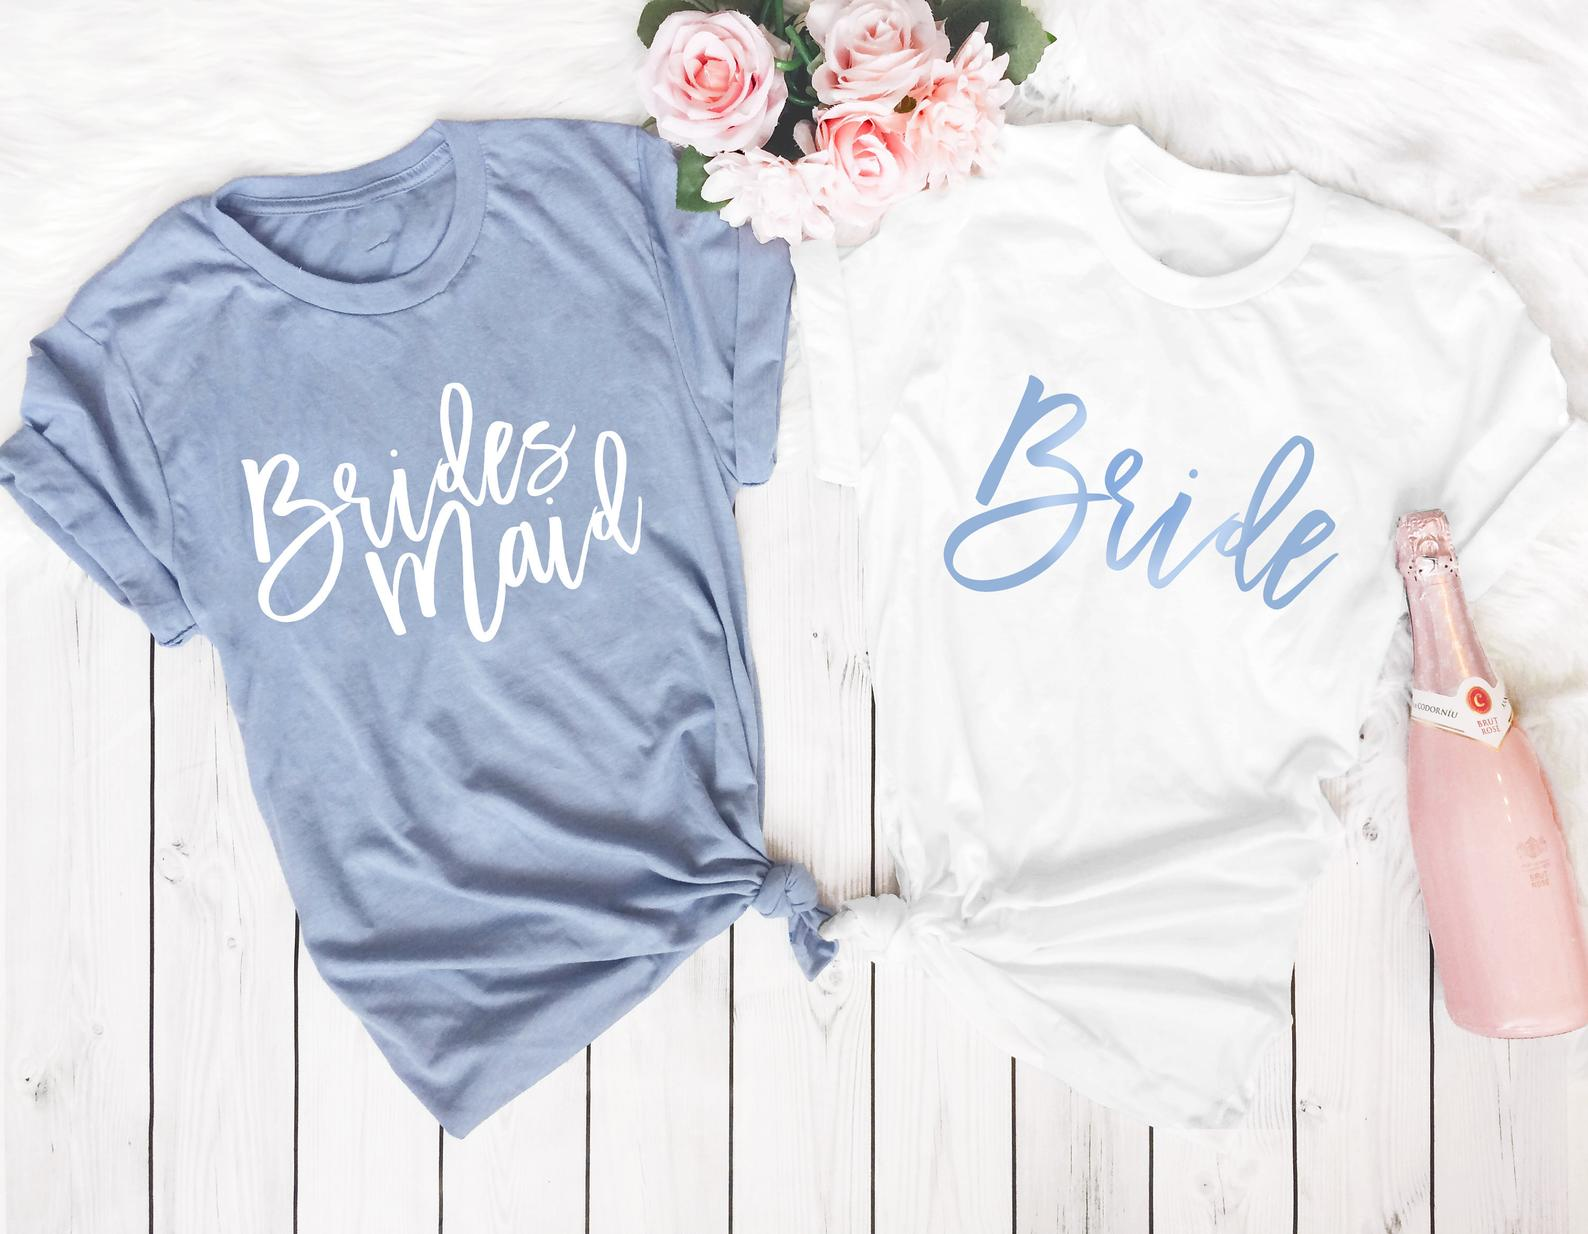 Super cute bridesmaid gift ideas featured on Nashville Bride Guide